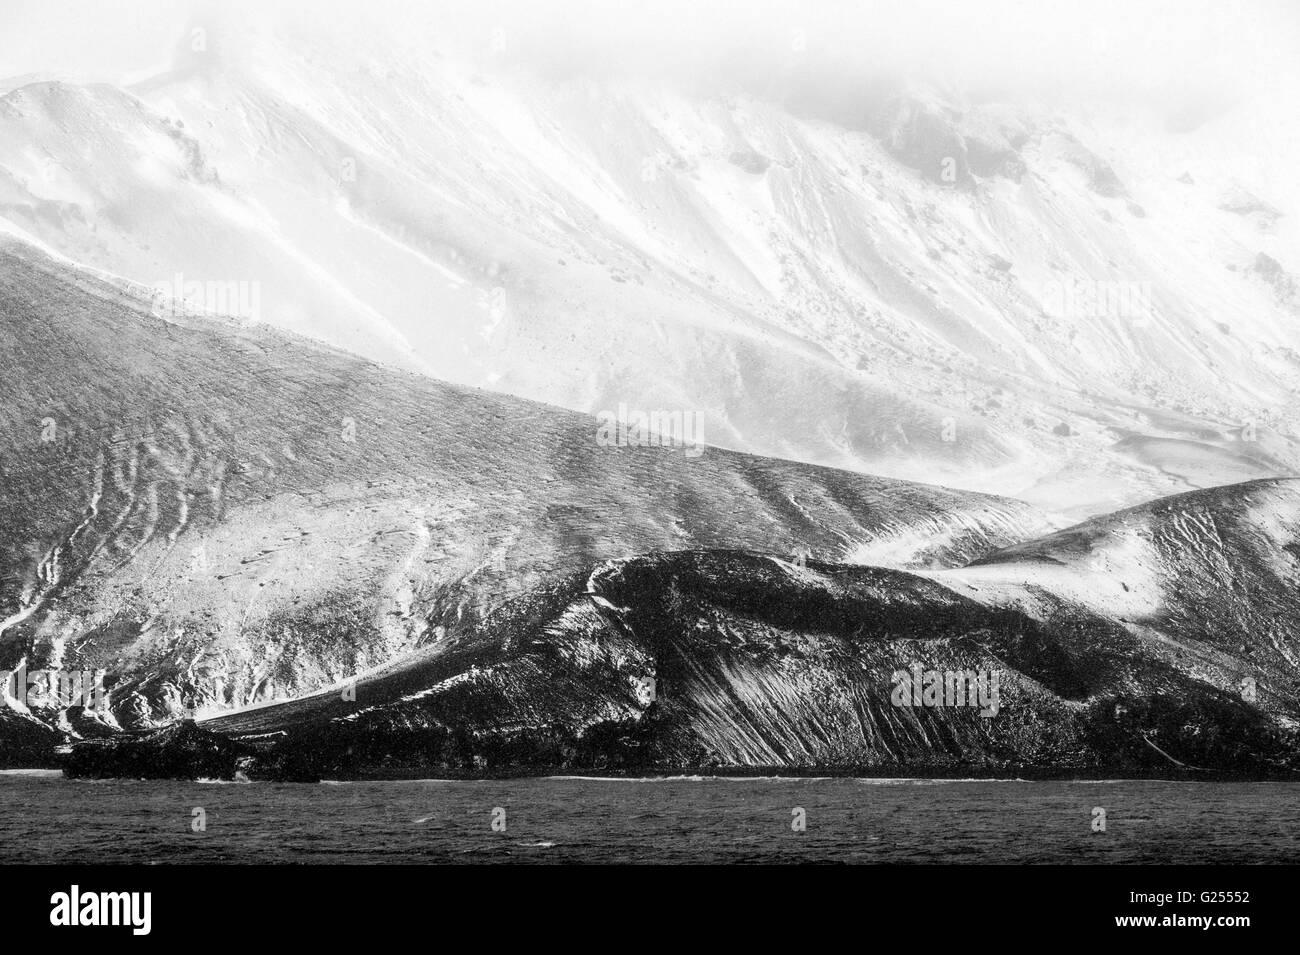 Mountains inside the caldera Deception Island, South Shetland Islands, Antarctica - Stock Image